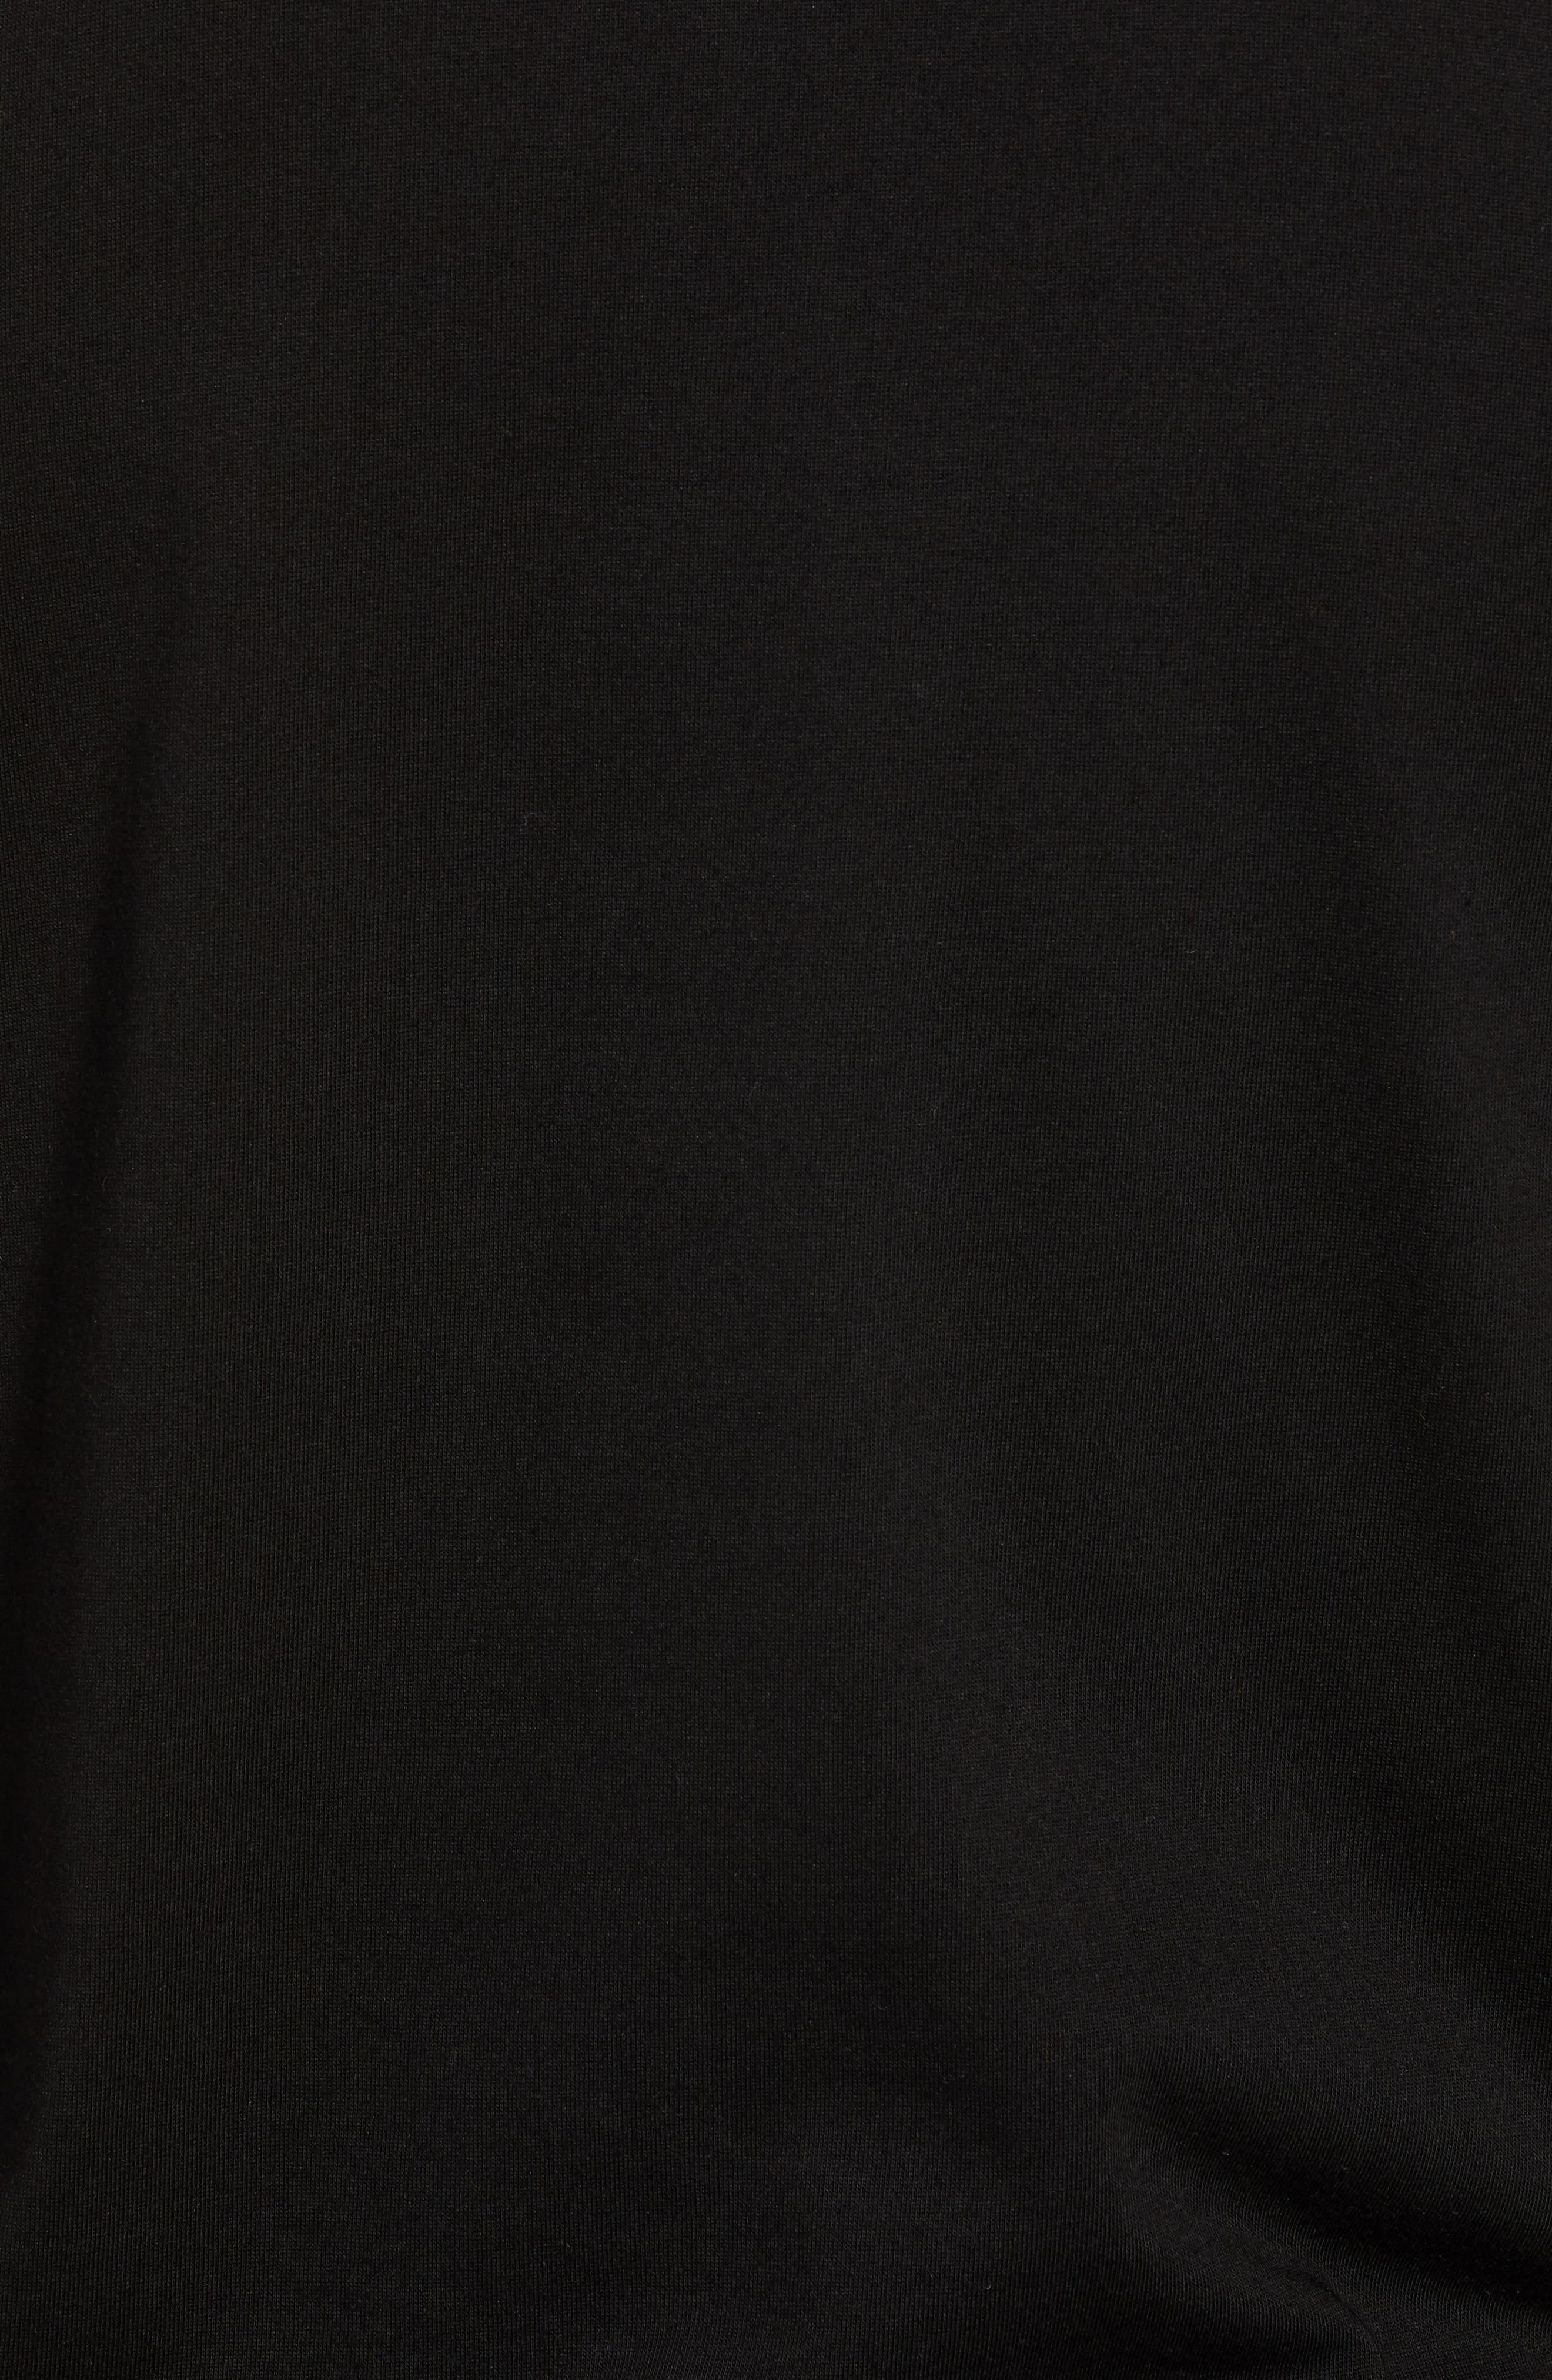 Ultra Dry Regular Fit Jersey T-Shirt,                             Alternate thumbnail 5, color,                             BLACK/ INKWELL WHITE